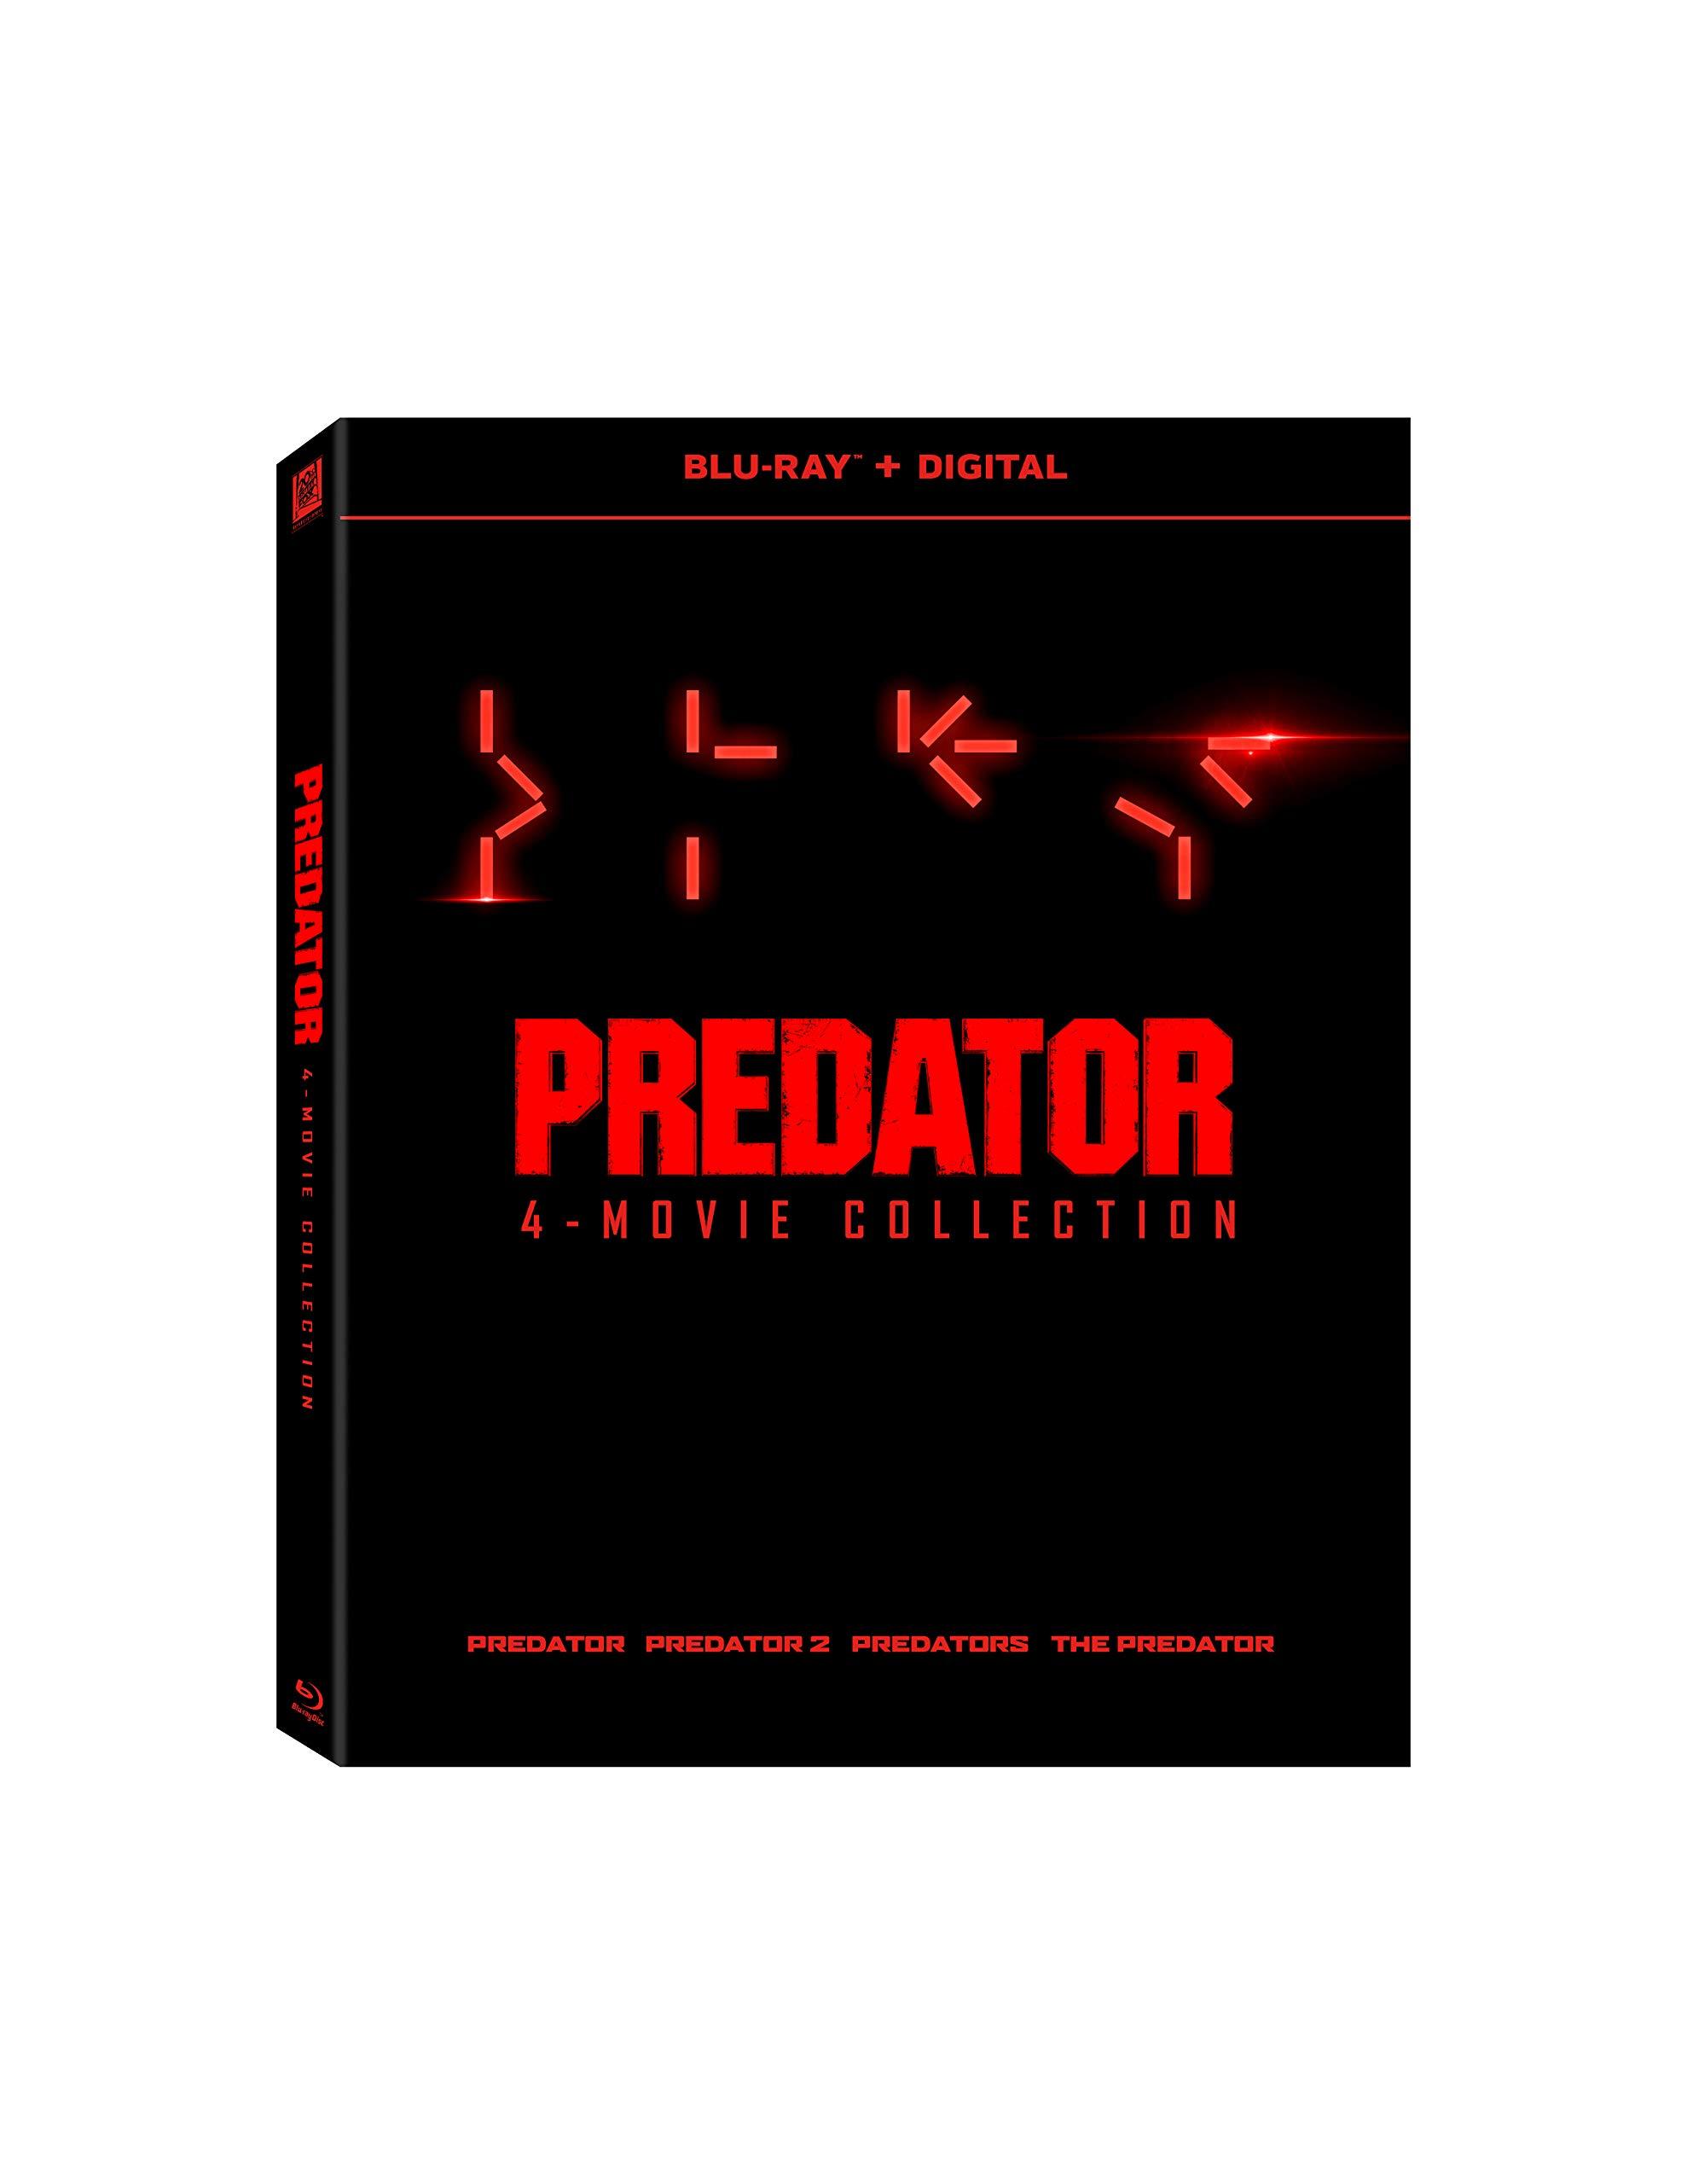 Blu-ray : Predator 1-4 (Digital Copy, Widescreen, Subtitled, Dolby)